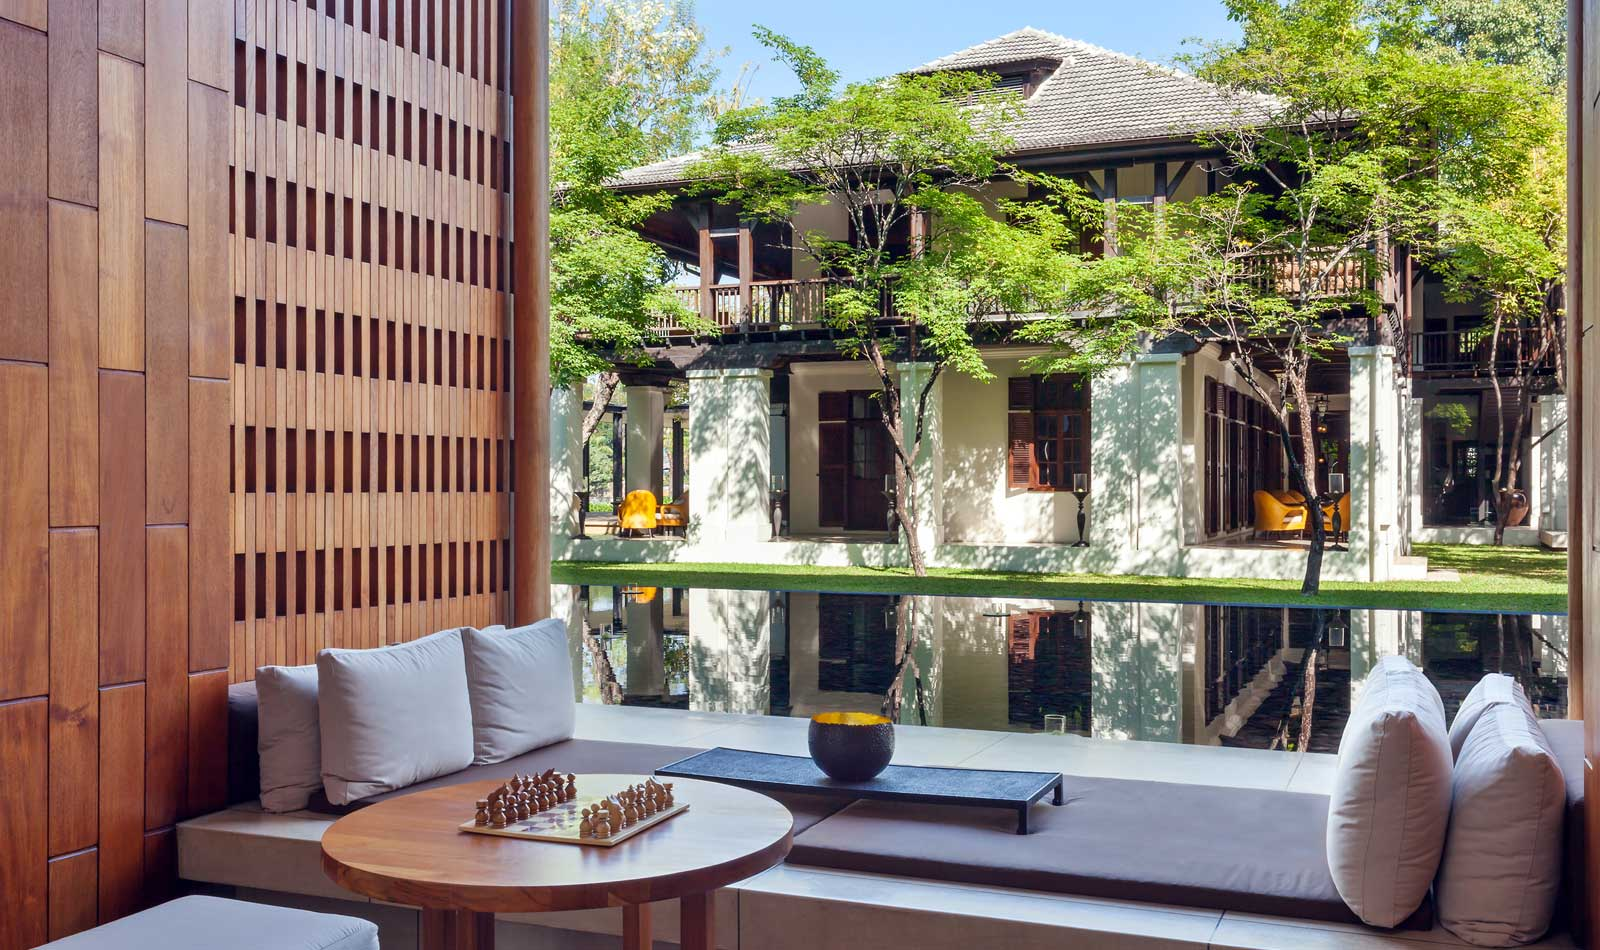 Lobby Lounge dengan pemandangan rumah kolonial.